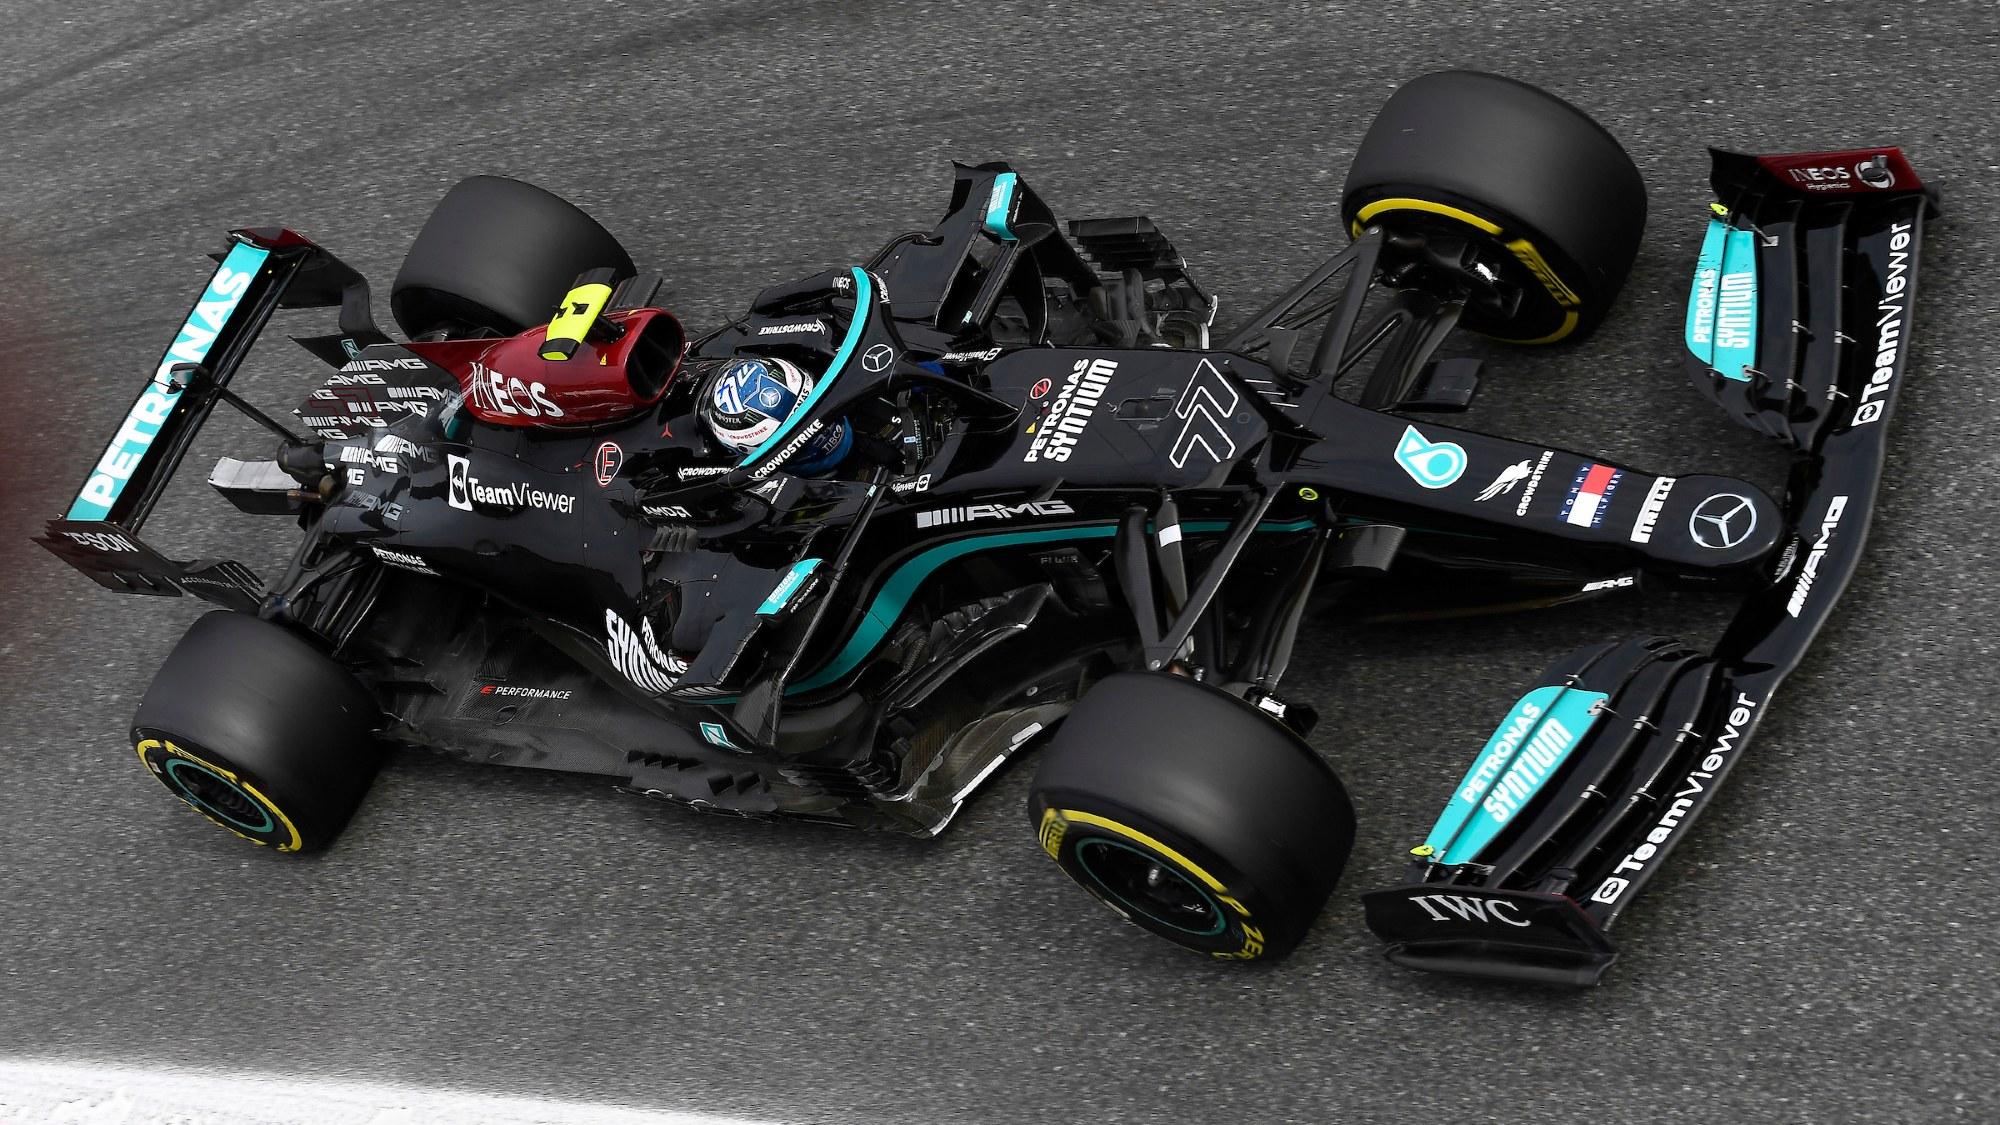 Valtteri Bottas, 2021 Italian GP